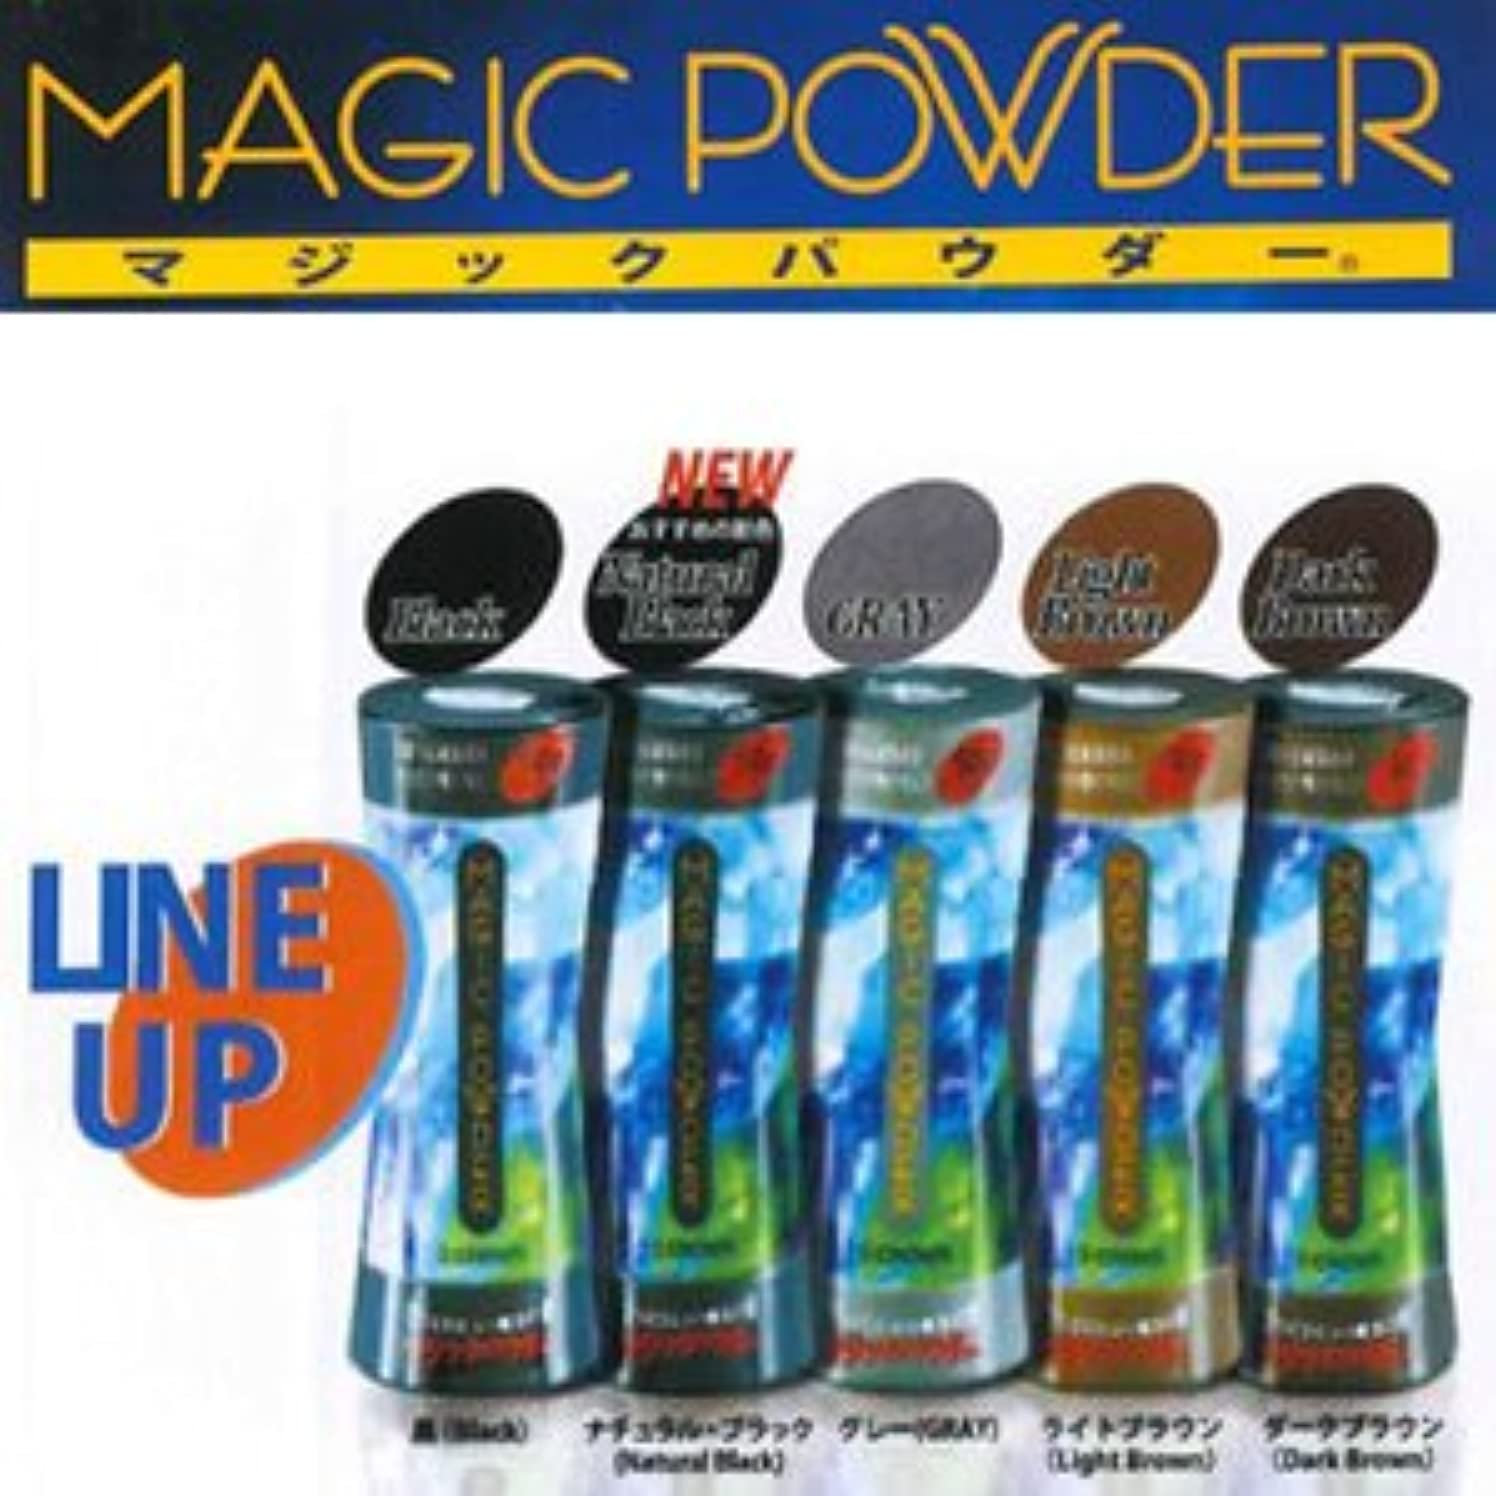 MAGIC POWDER マジックパウダー ライトブラウン 50g  ※貴方の髪を簡単ボリュームアップ!